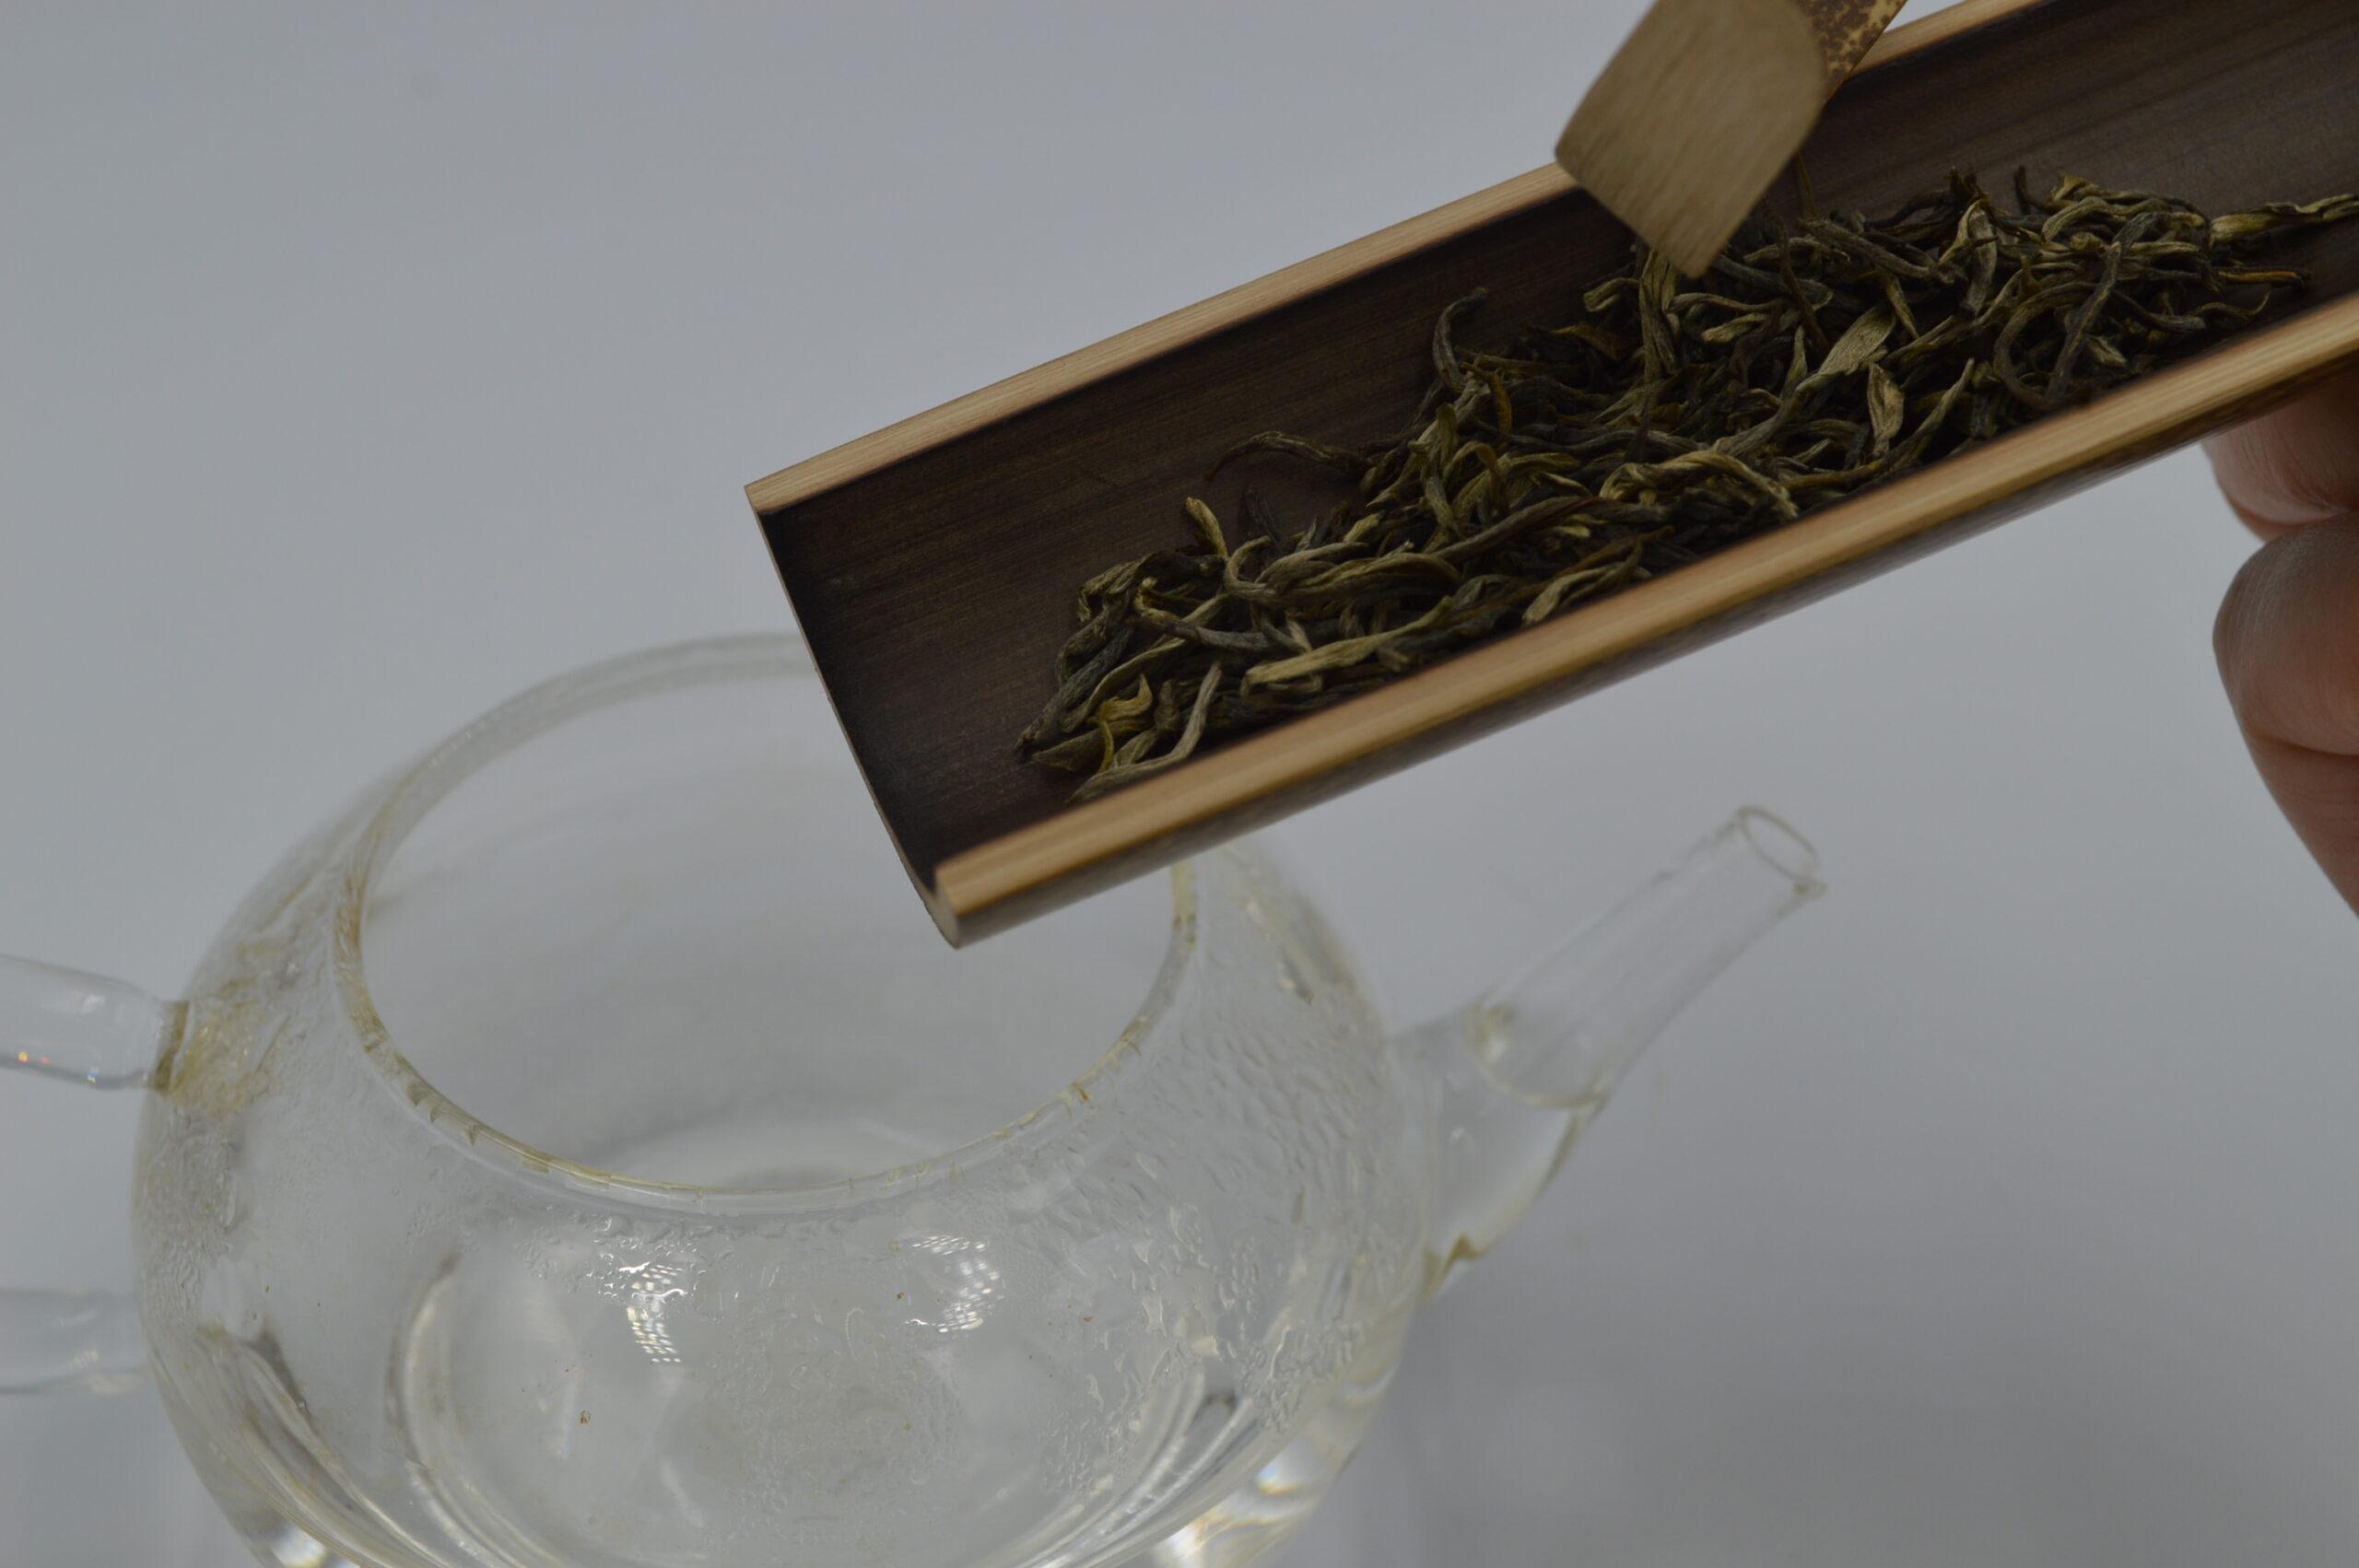 https://shop.liu-tea-art.com/wp-content/uploads/2021/05/DSC_0044-scaled.jpg